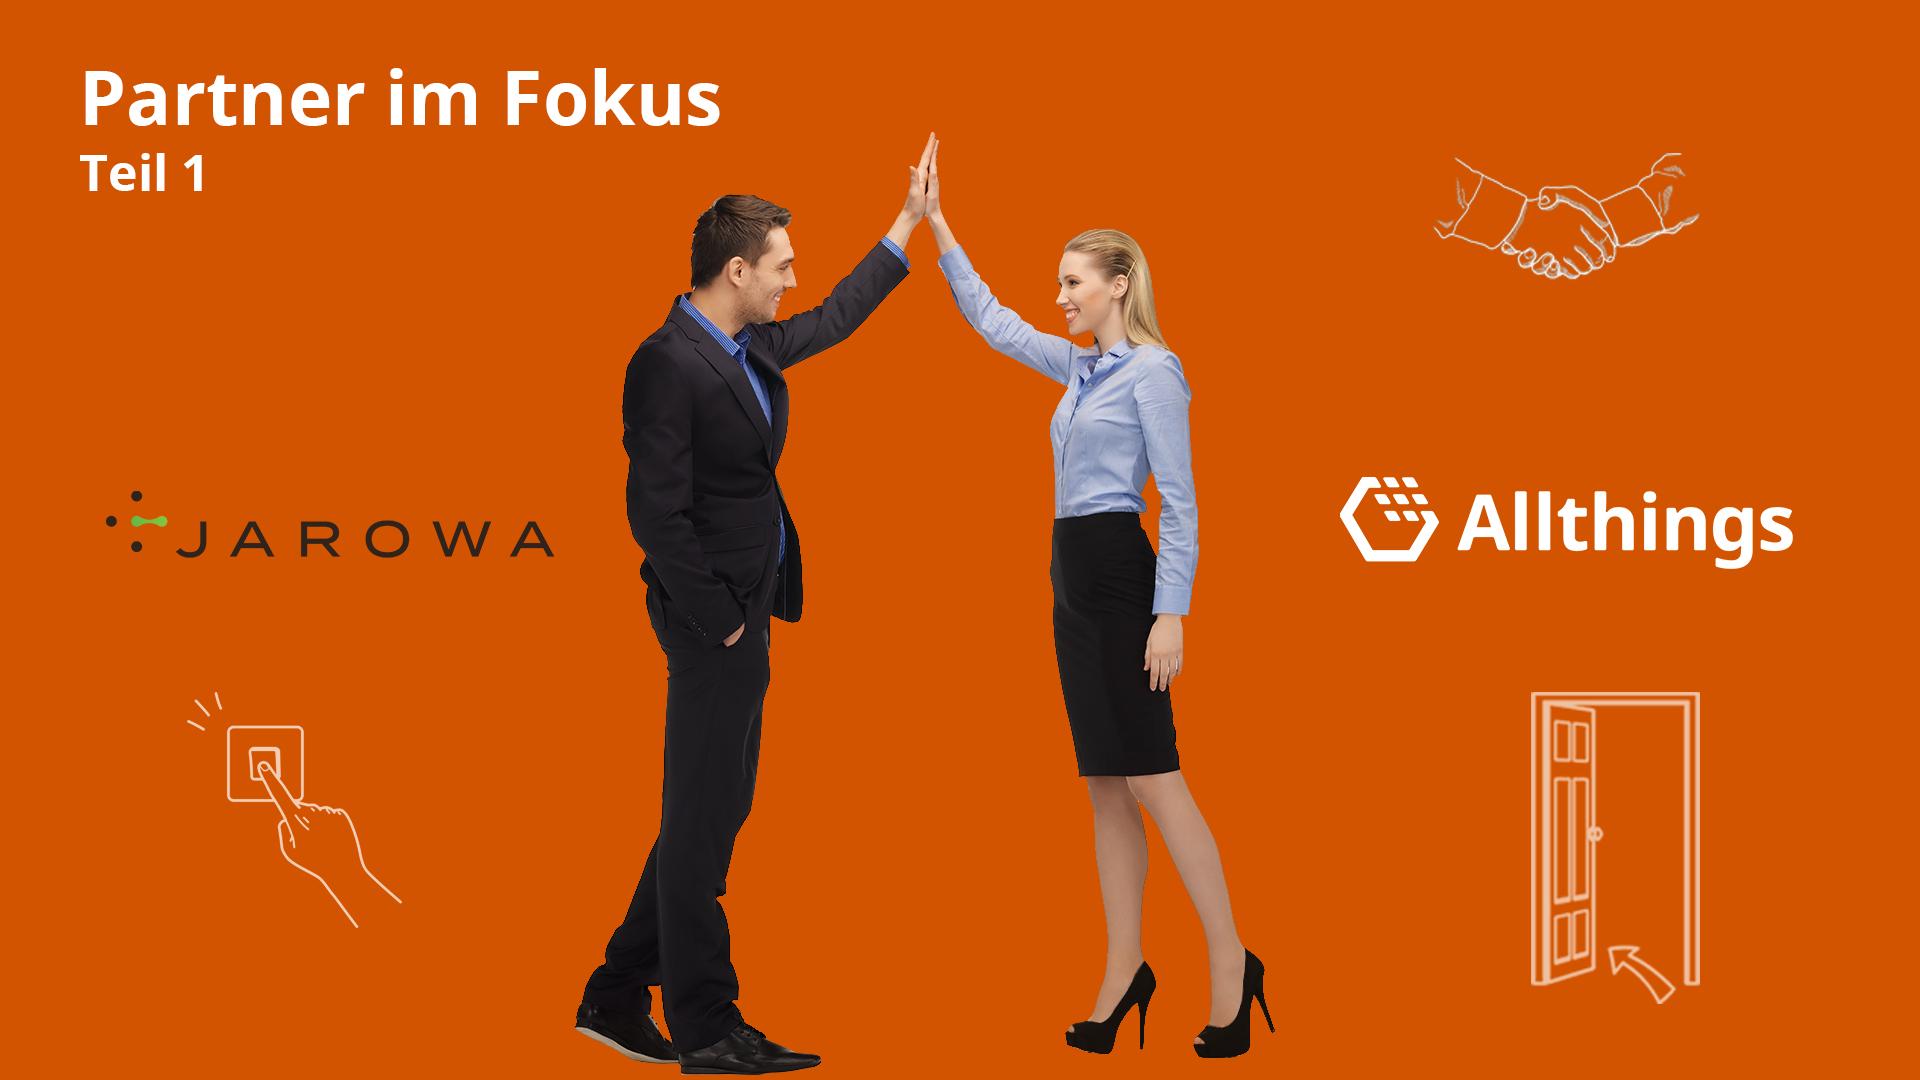 https://f.hubspotusercontent20.net/hubfs/6100123/201106_Partner_im_Fokus_JAROWA_2.png